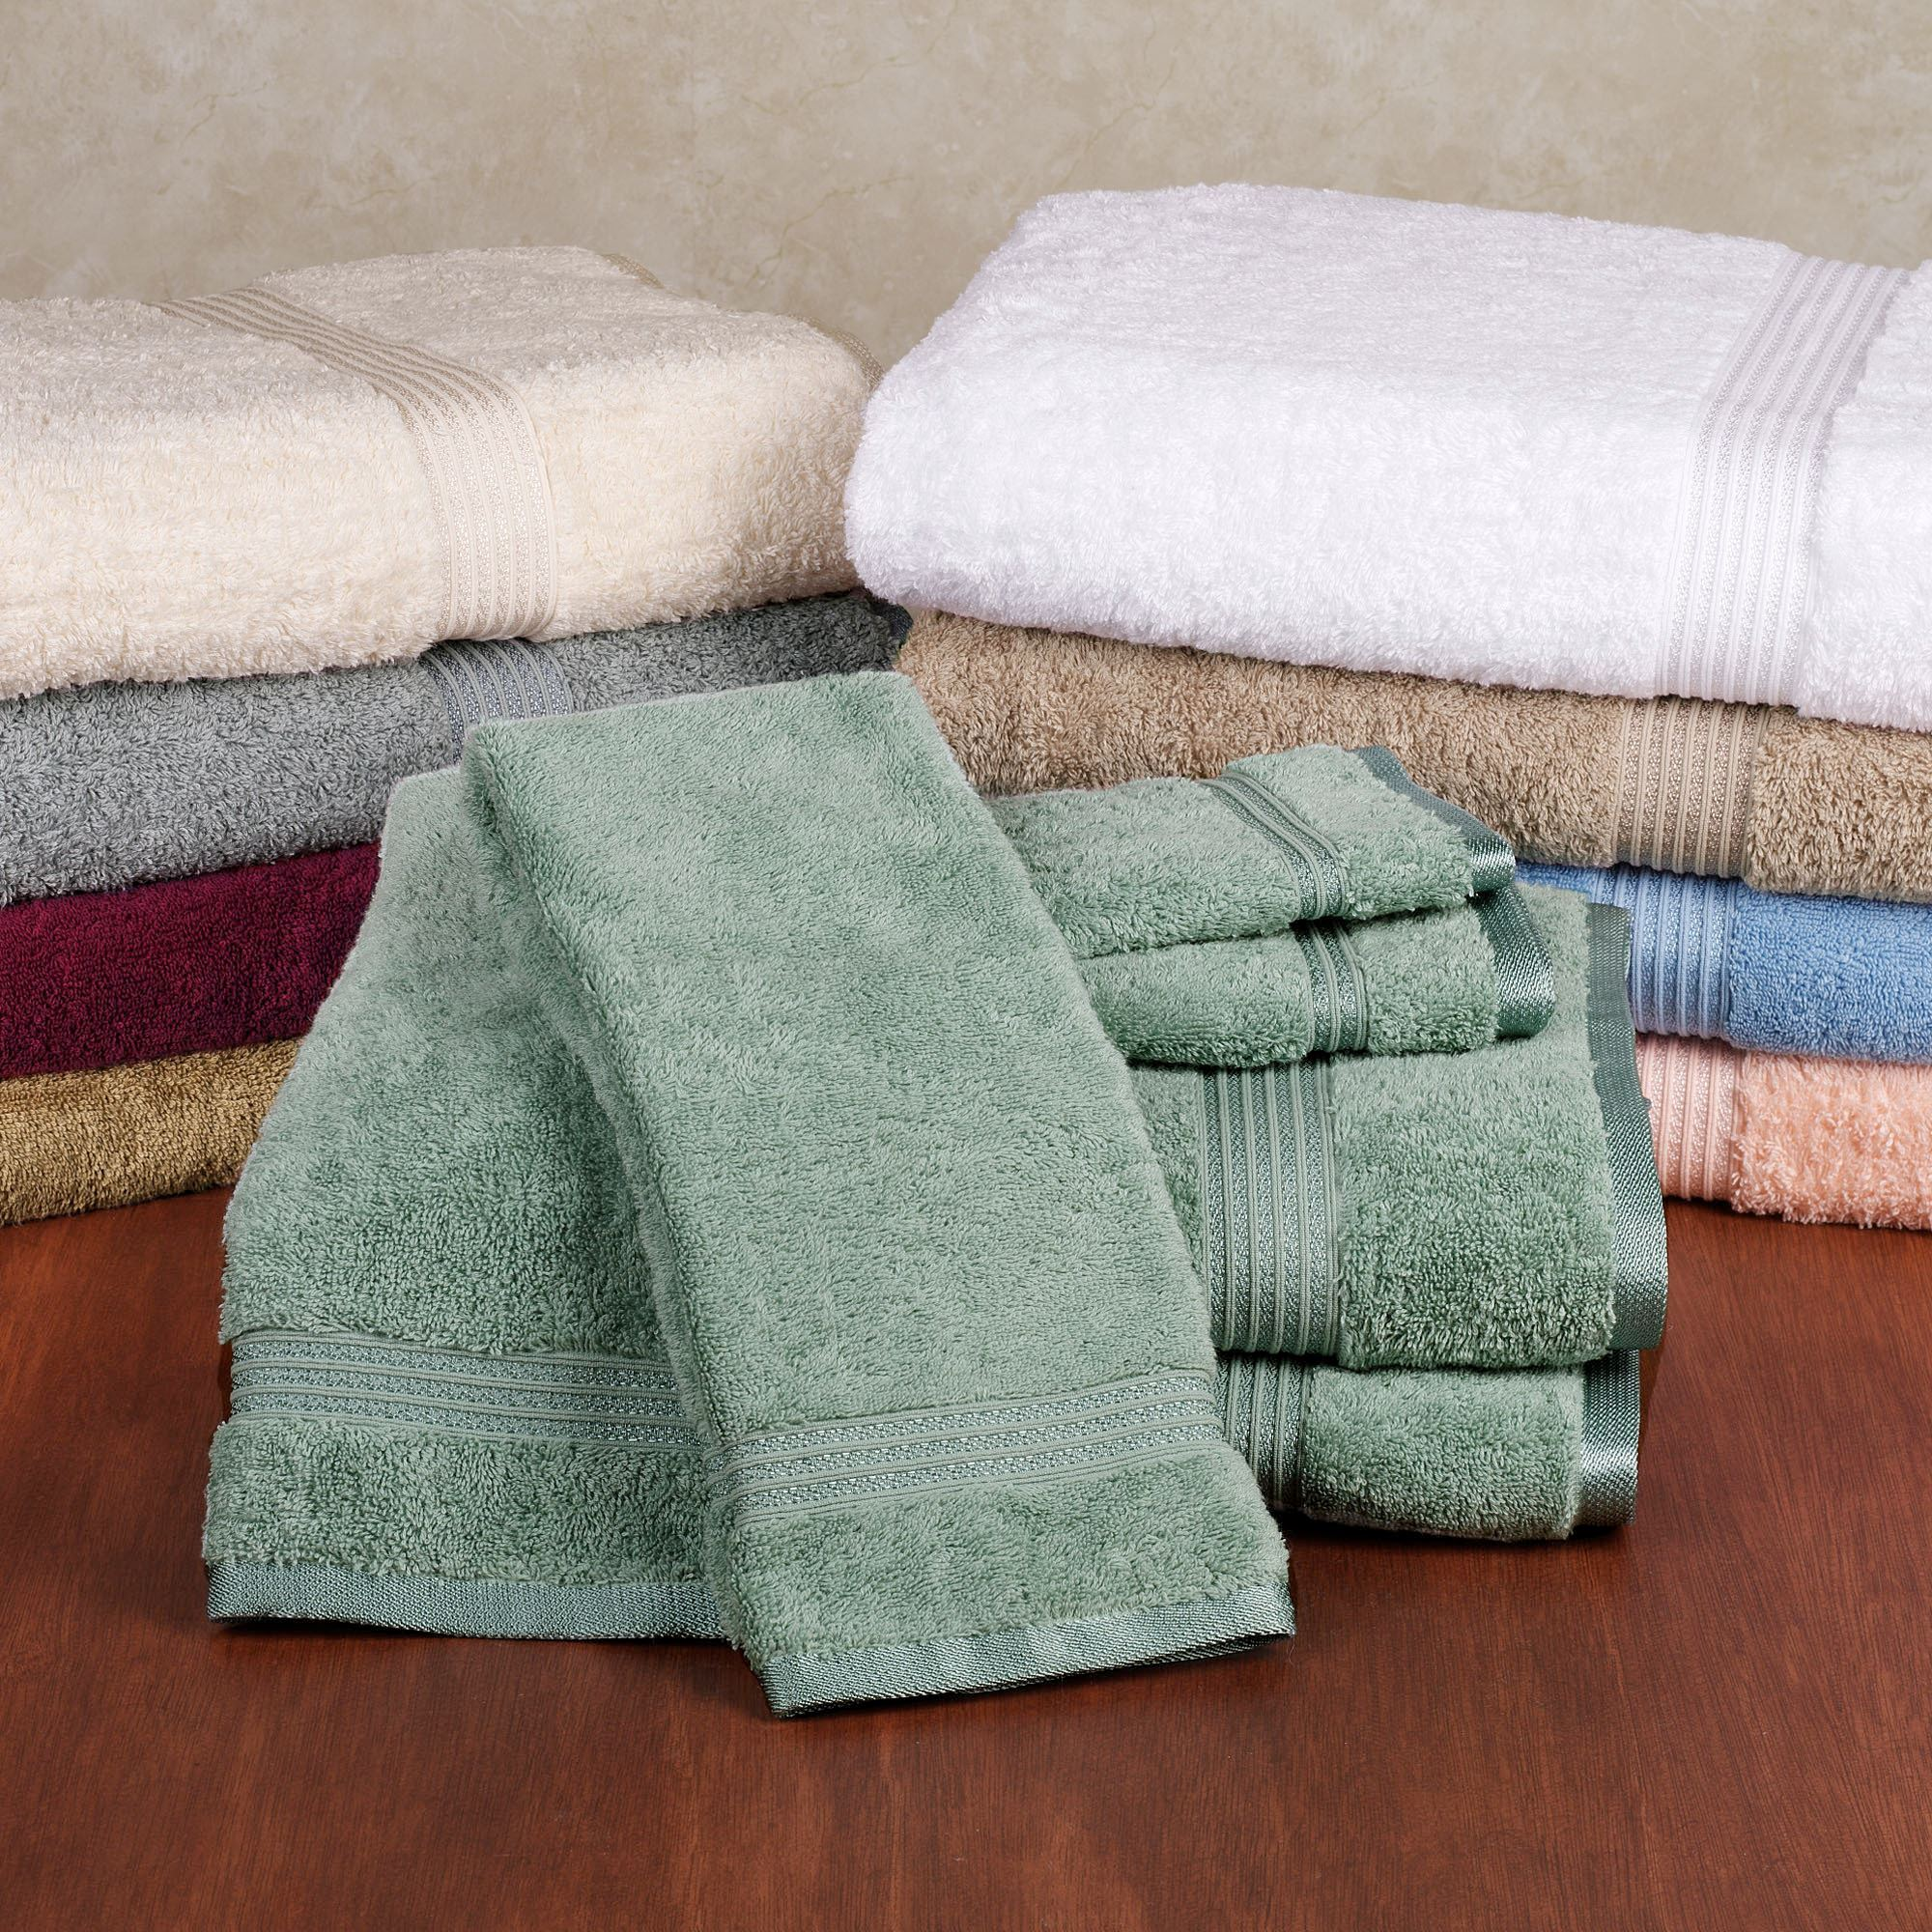 600 Gsm Superior 6 Pc Towel Set